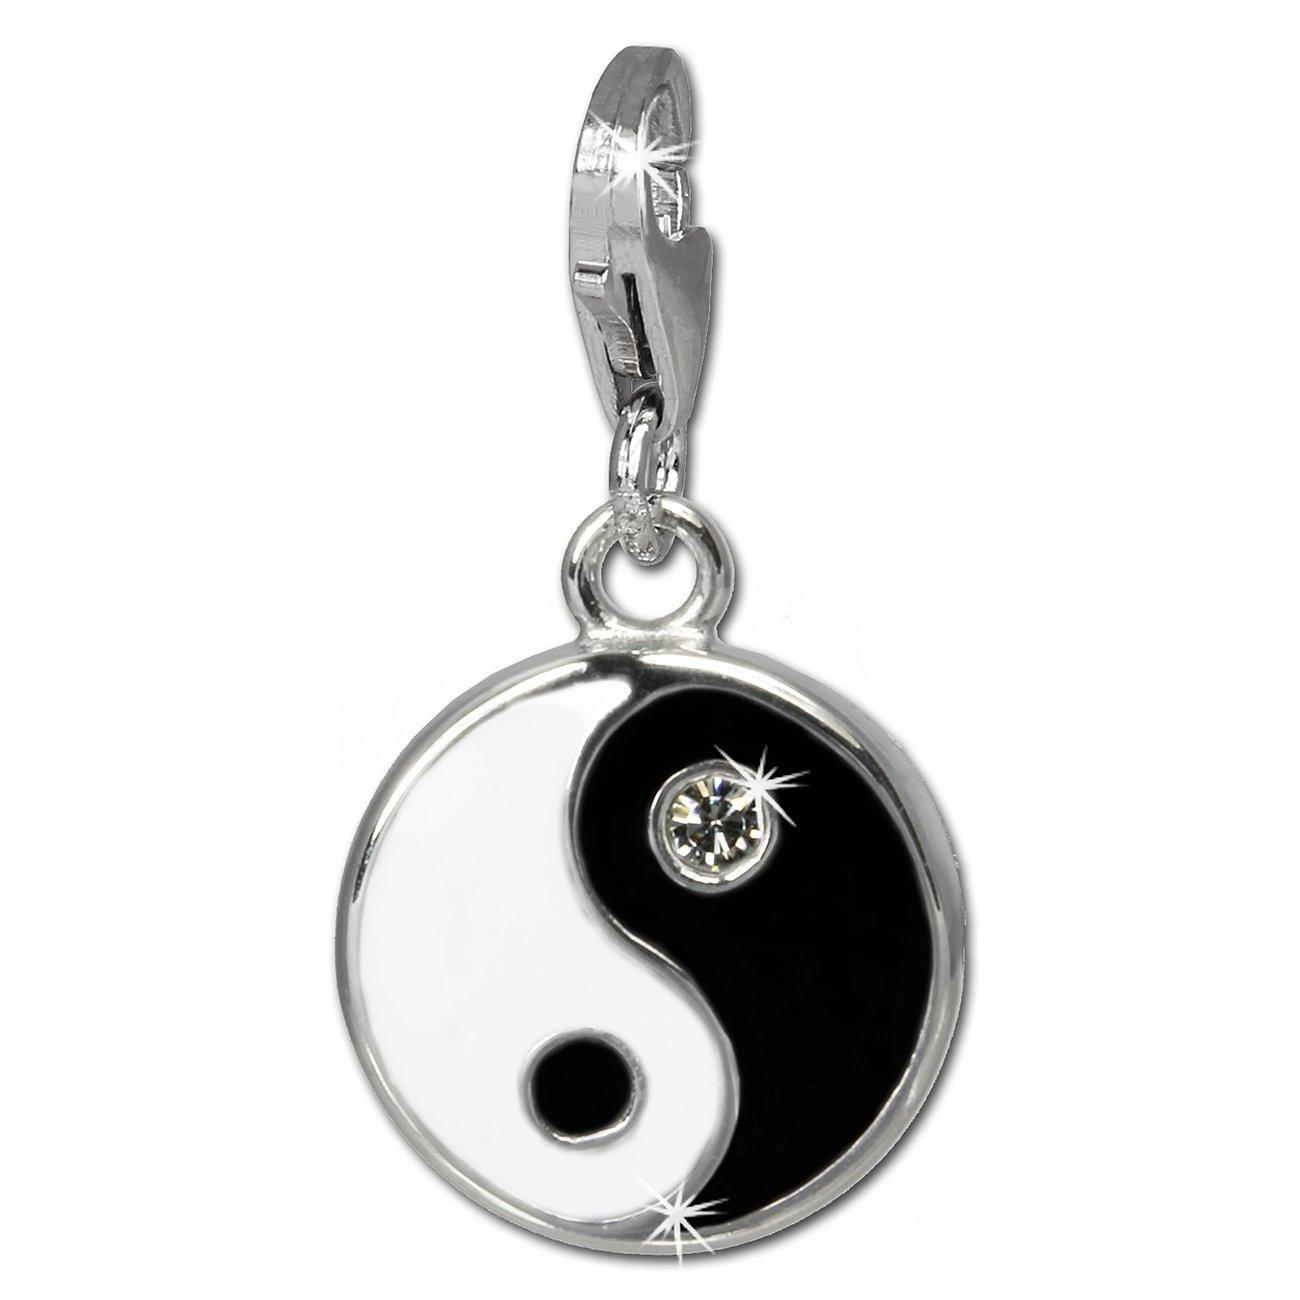 Charm 925 Sterling Silber Bead Anhänger Yin Yang Symbol Emaille Damen Nenalina